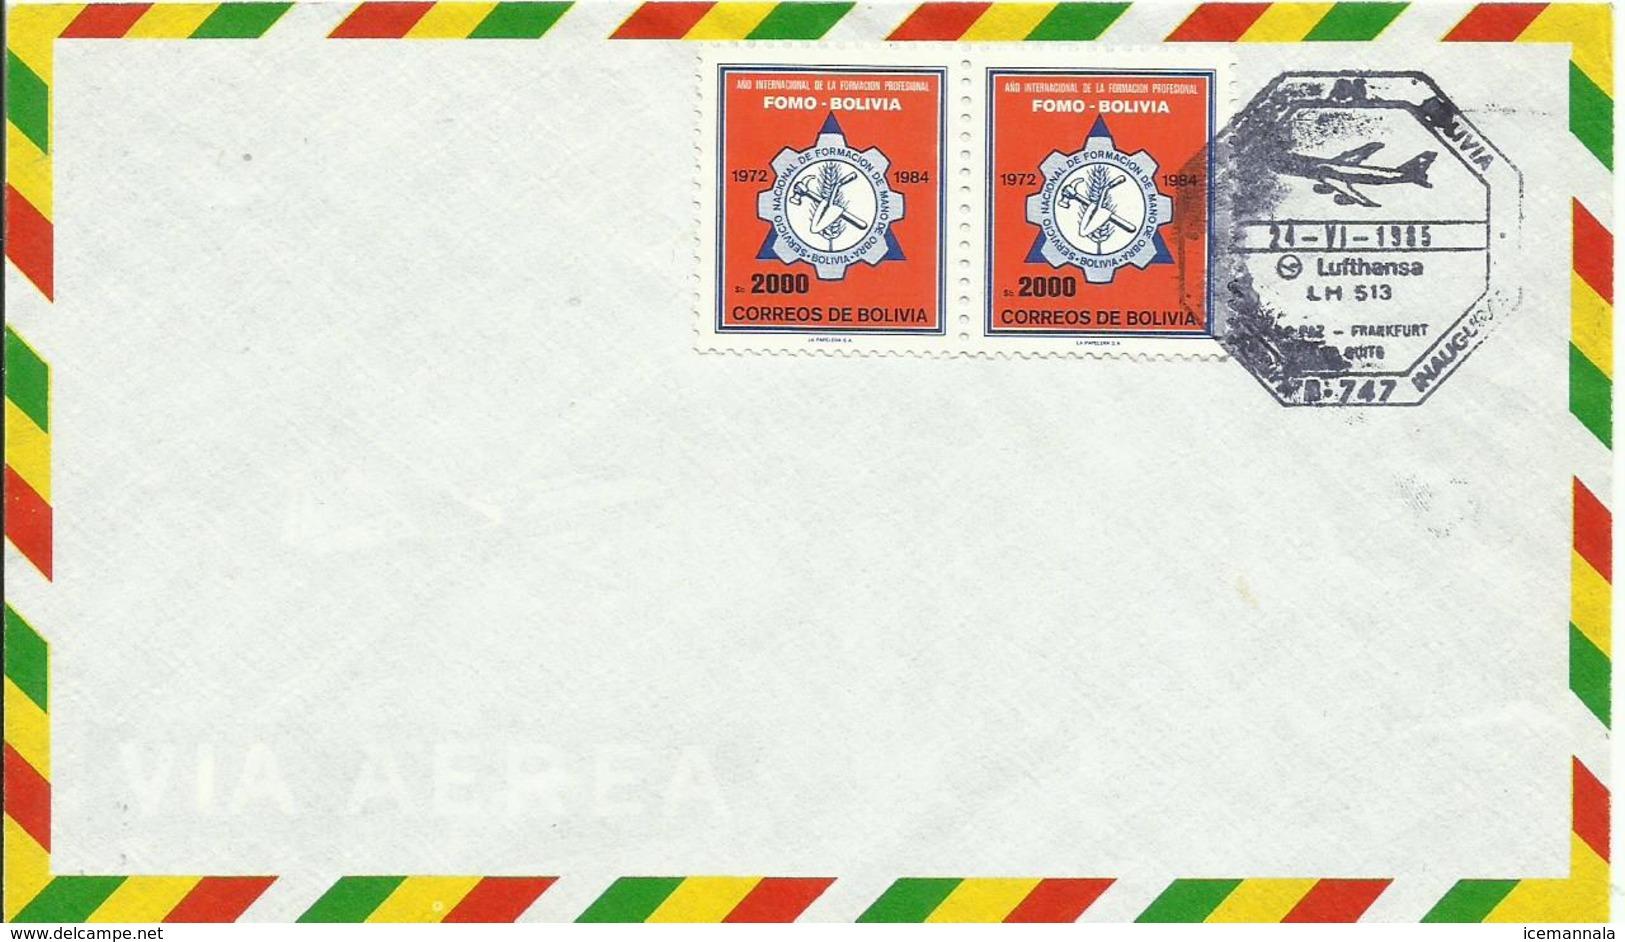 BOLIVIA SOBRE CON SELLO LUFTHANSA - Bolivia